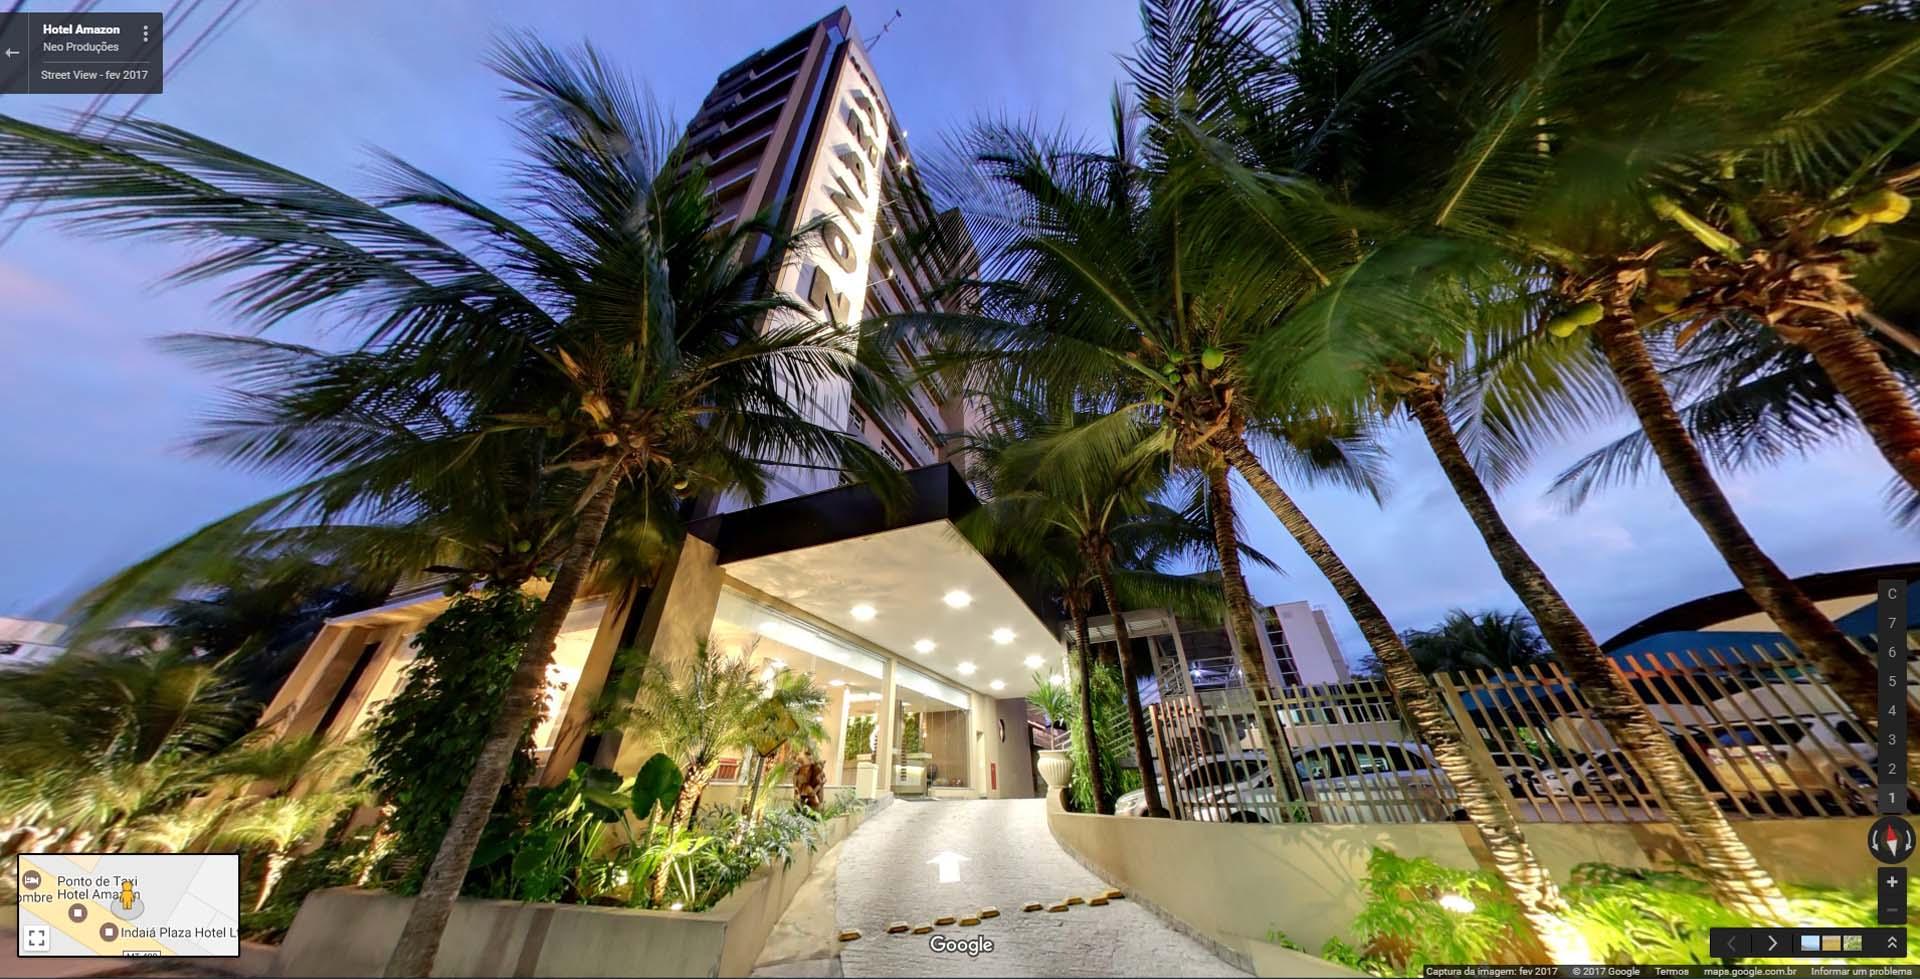 Hotel Amazon